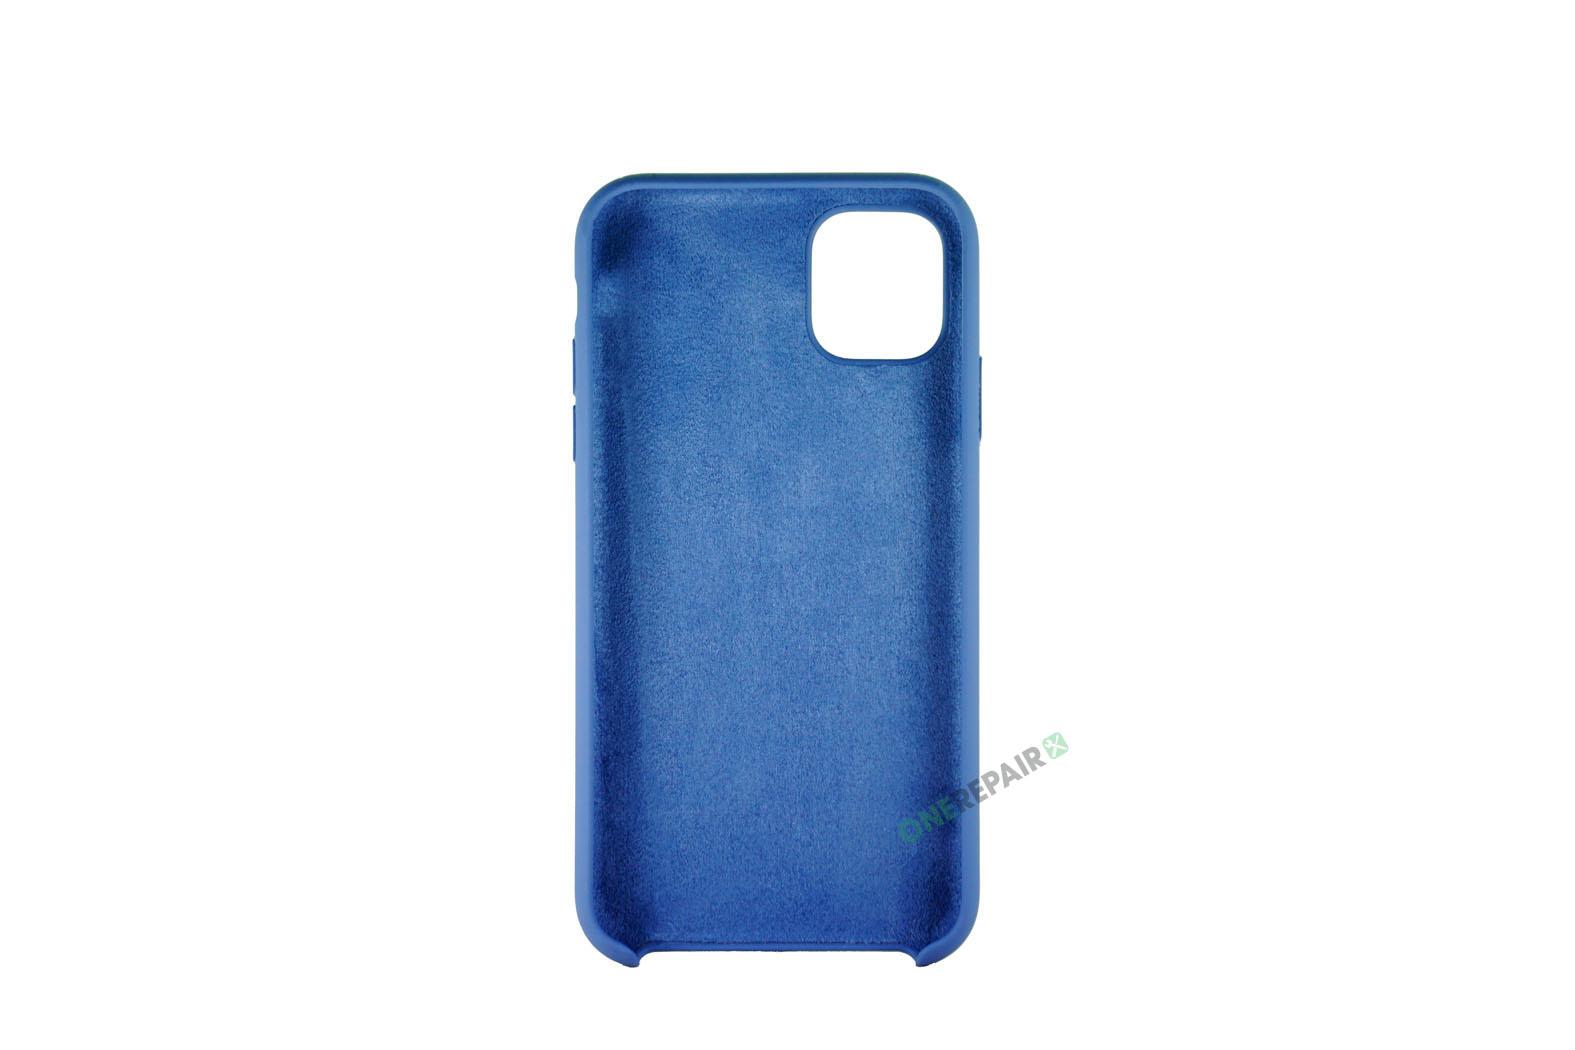 353776-003_iPhone_11_Silikone_cover_blaa_onerepair_00002